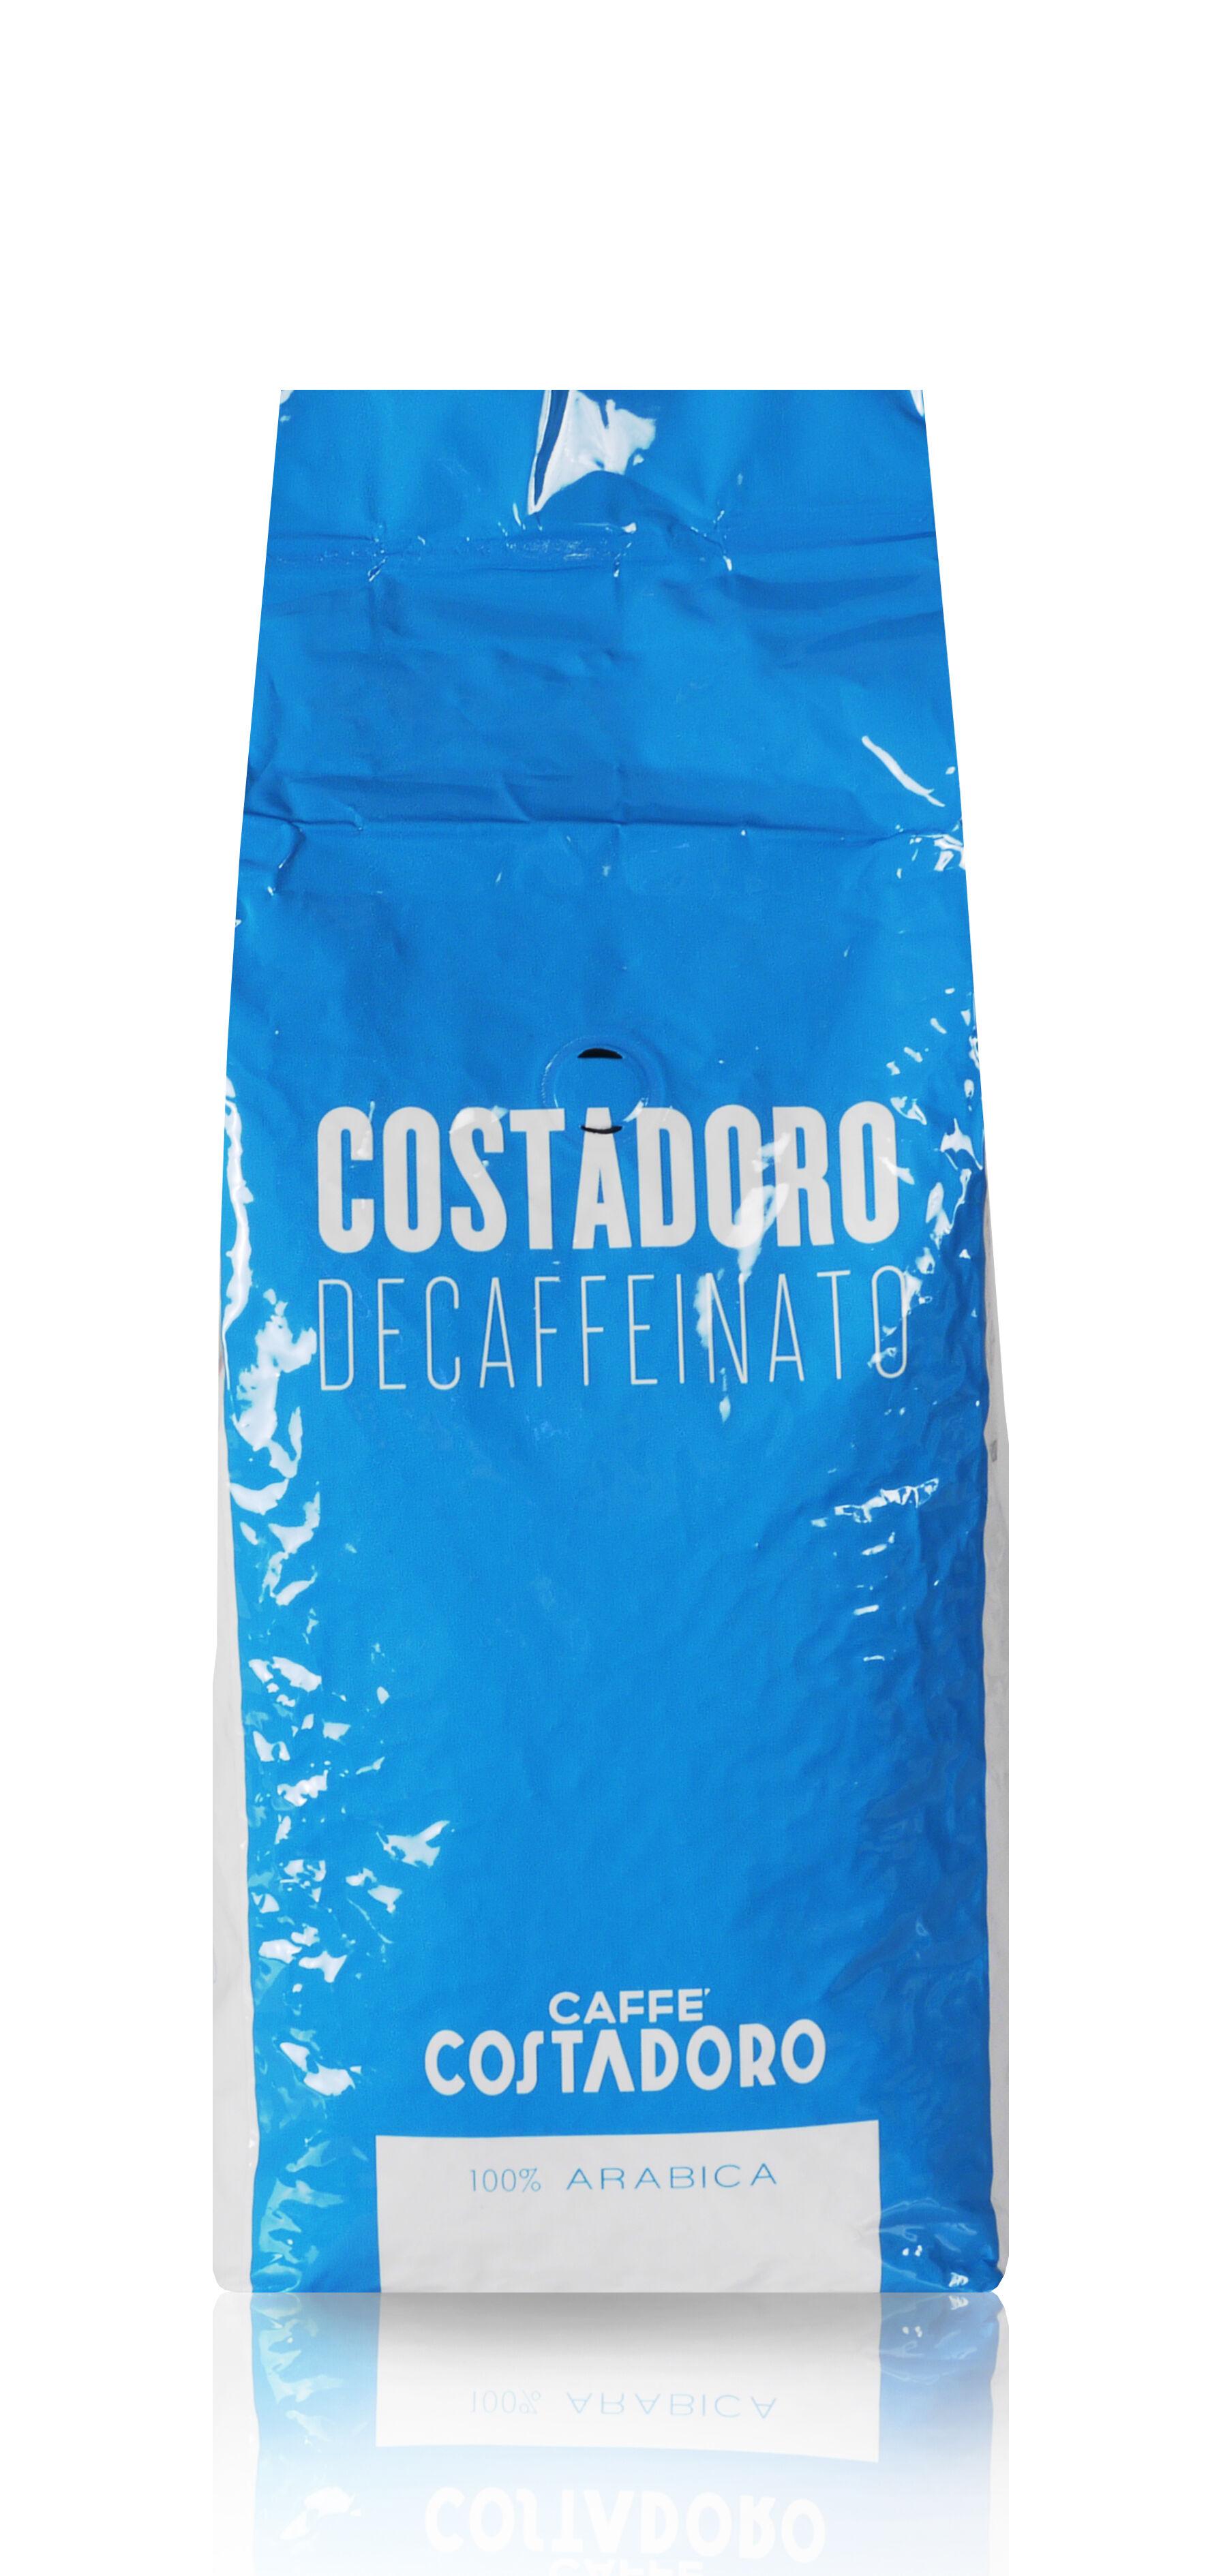 COSTADORO Decaffeinato 1 KG Bohnen im Beutel